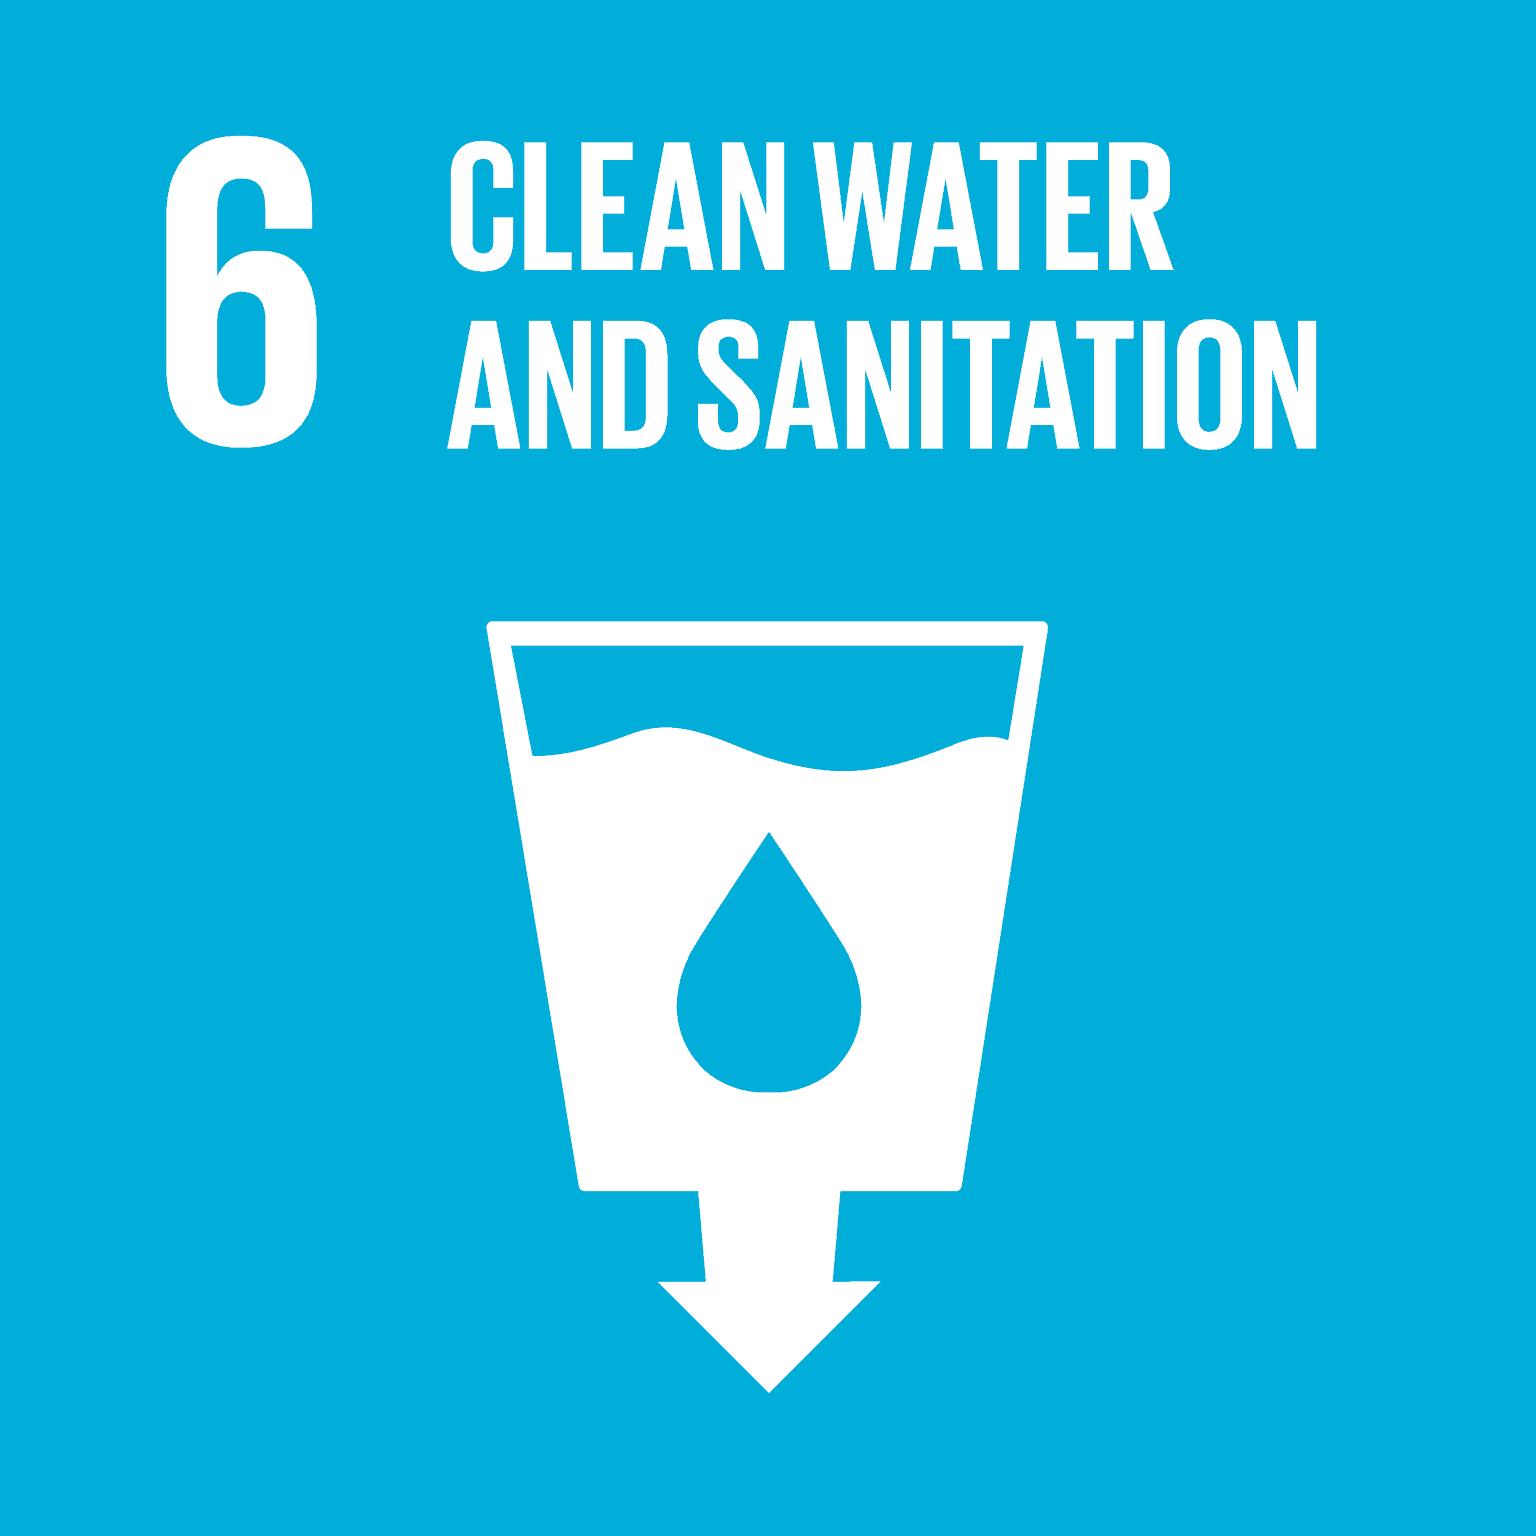 Un SDG Goal 6 - Clean Water and Sanitation